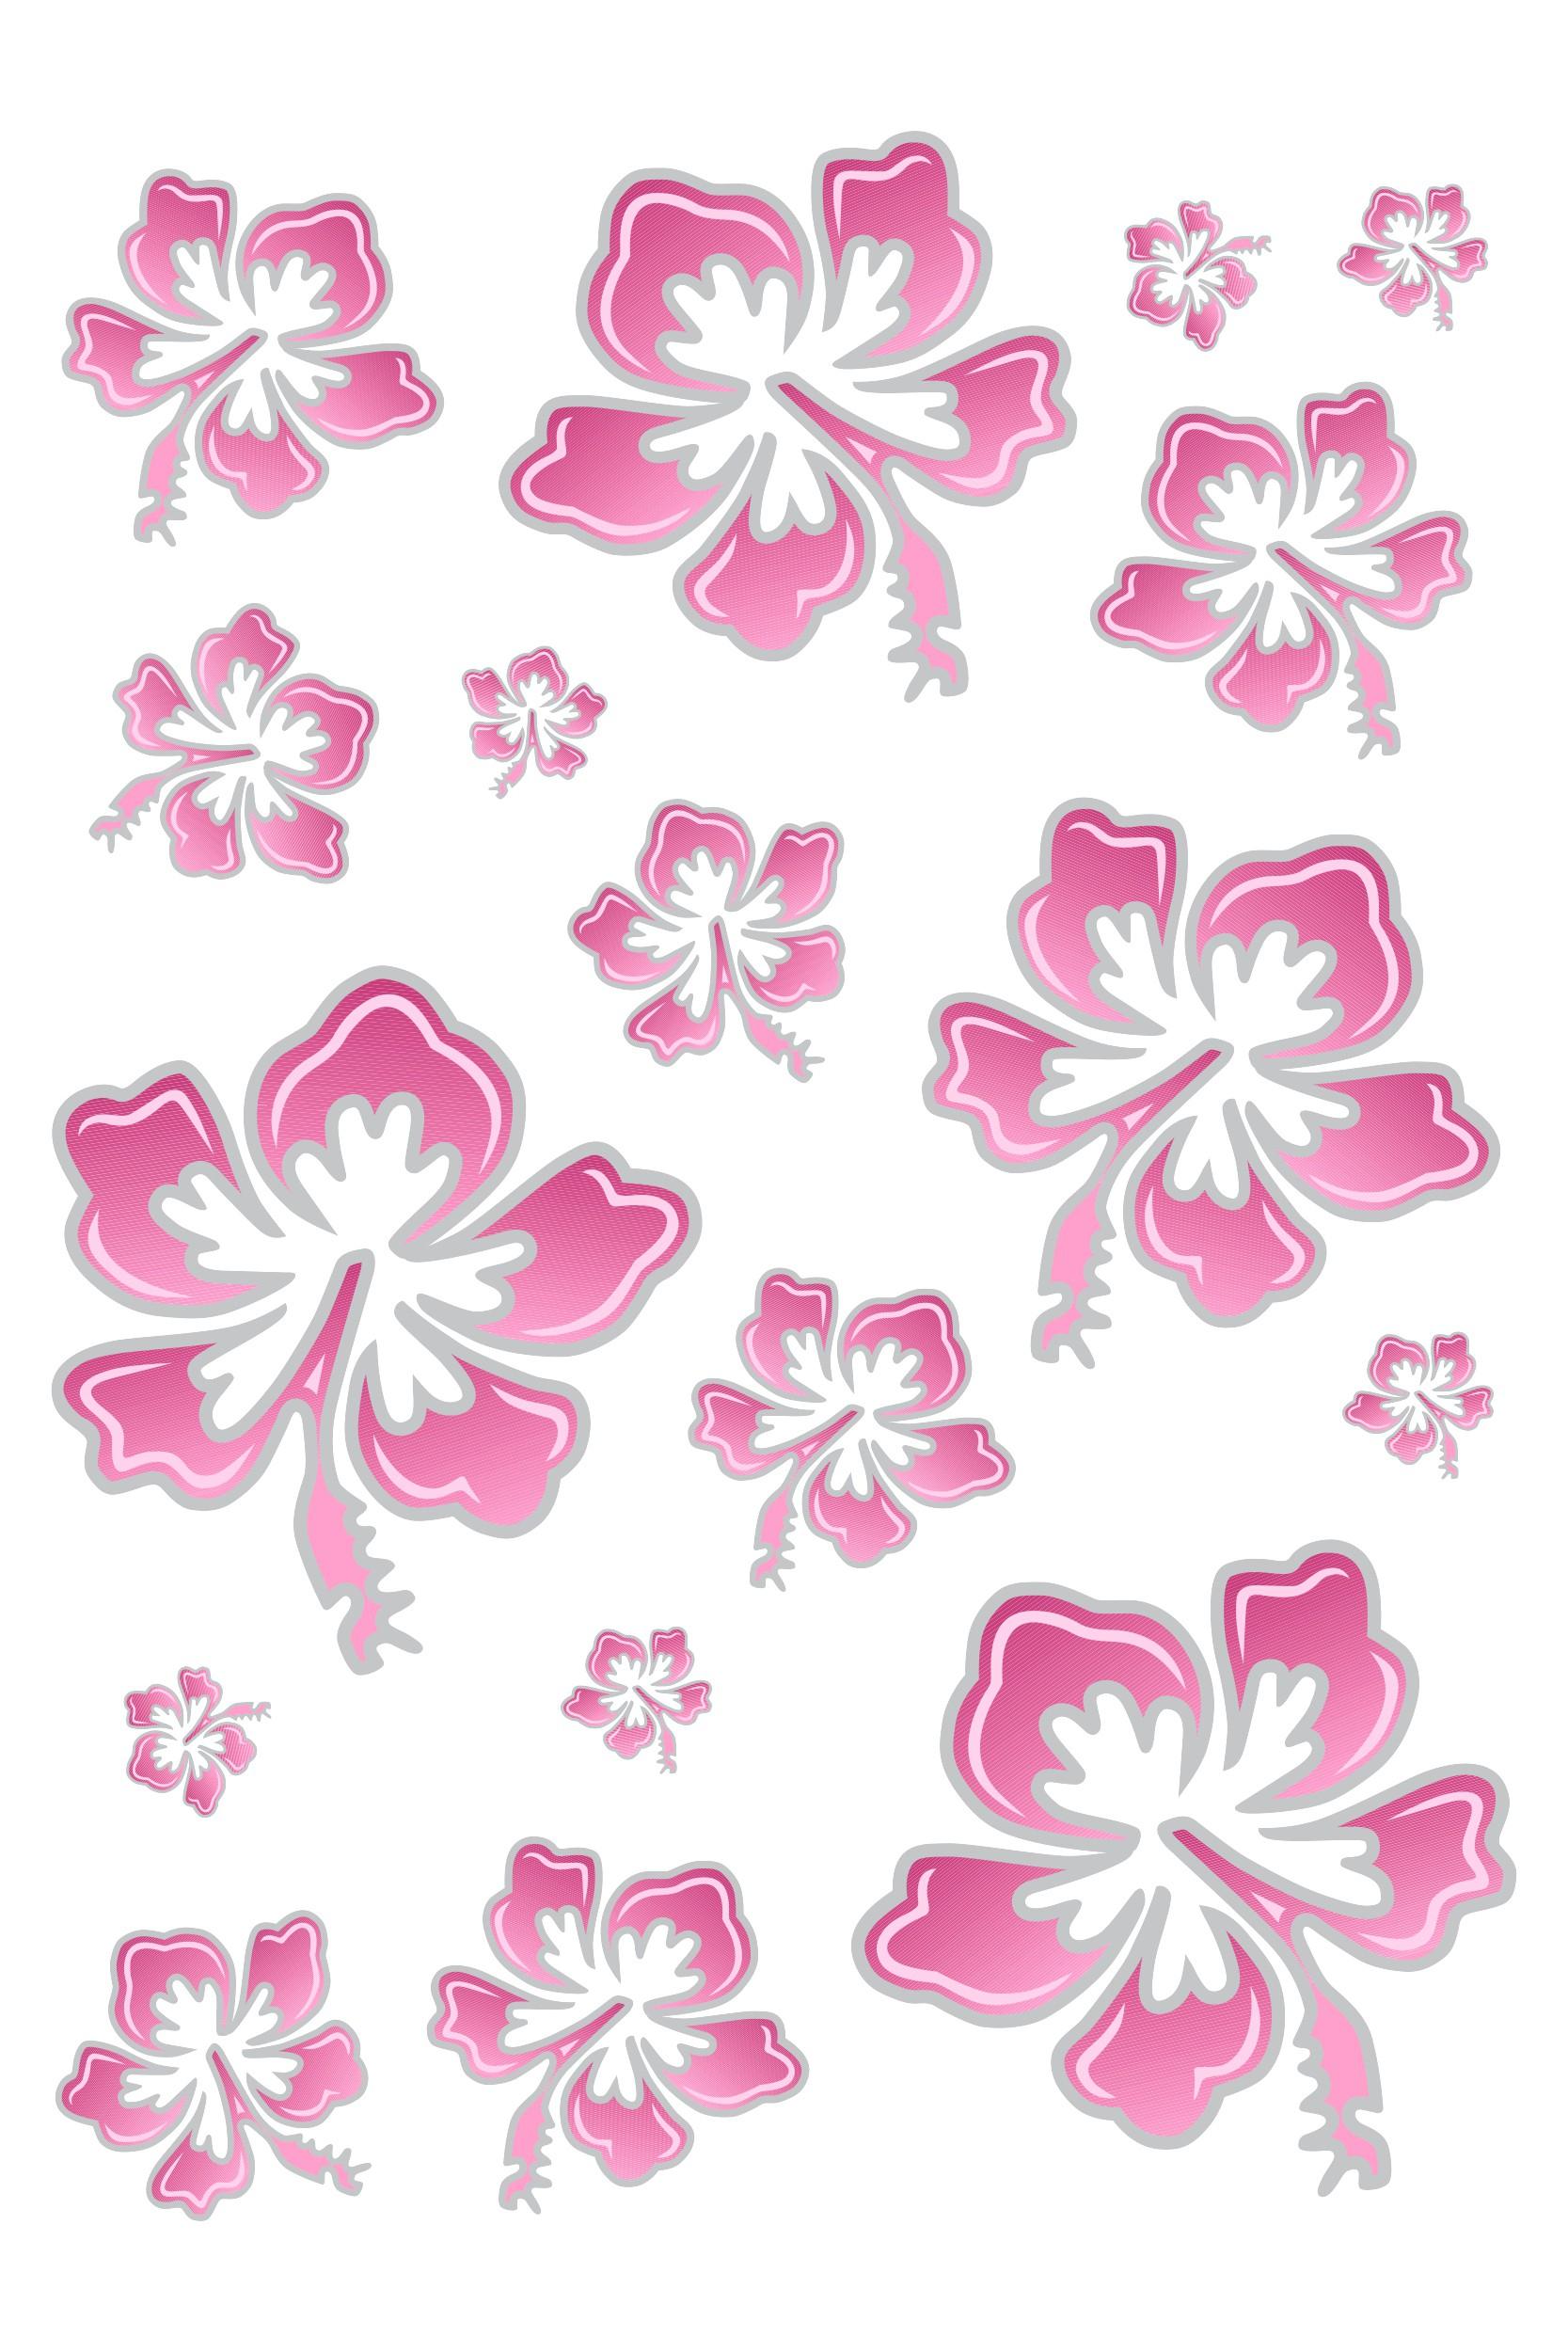 Aufkleber Hibiskusblüten-Set 300 x 200 mm rosa/silber